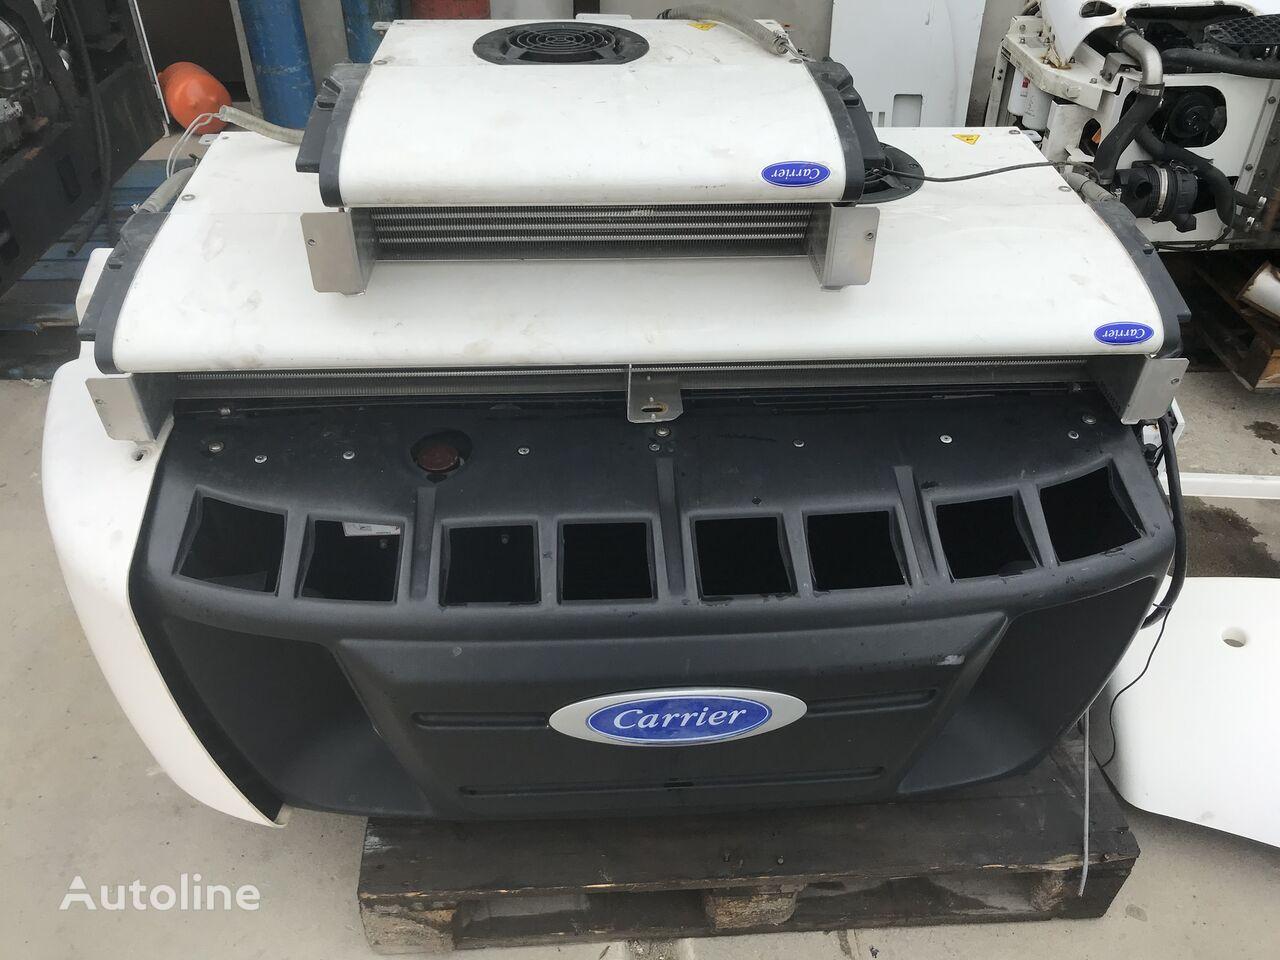 CARRIER - SUPRA 1250 refrigeration unit